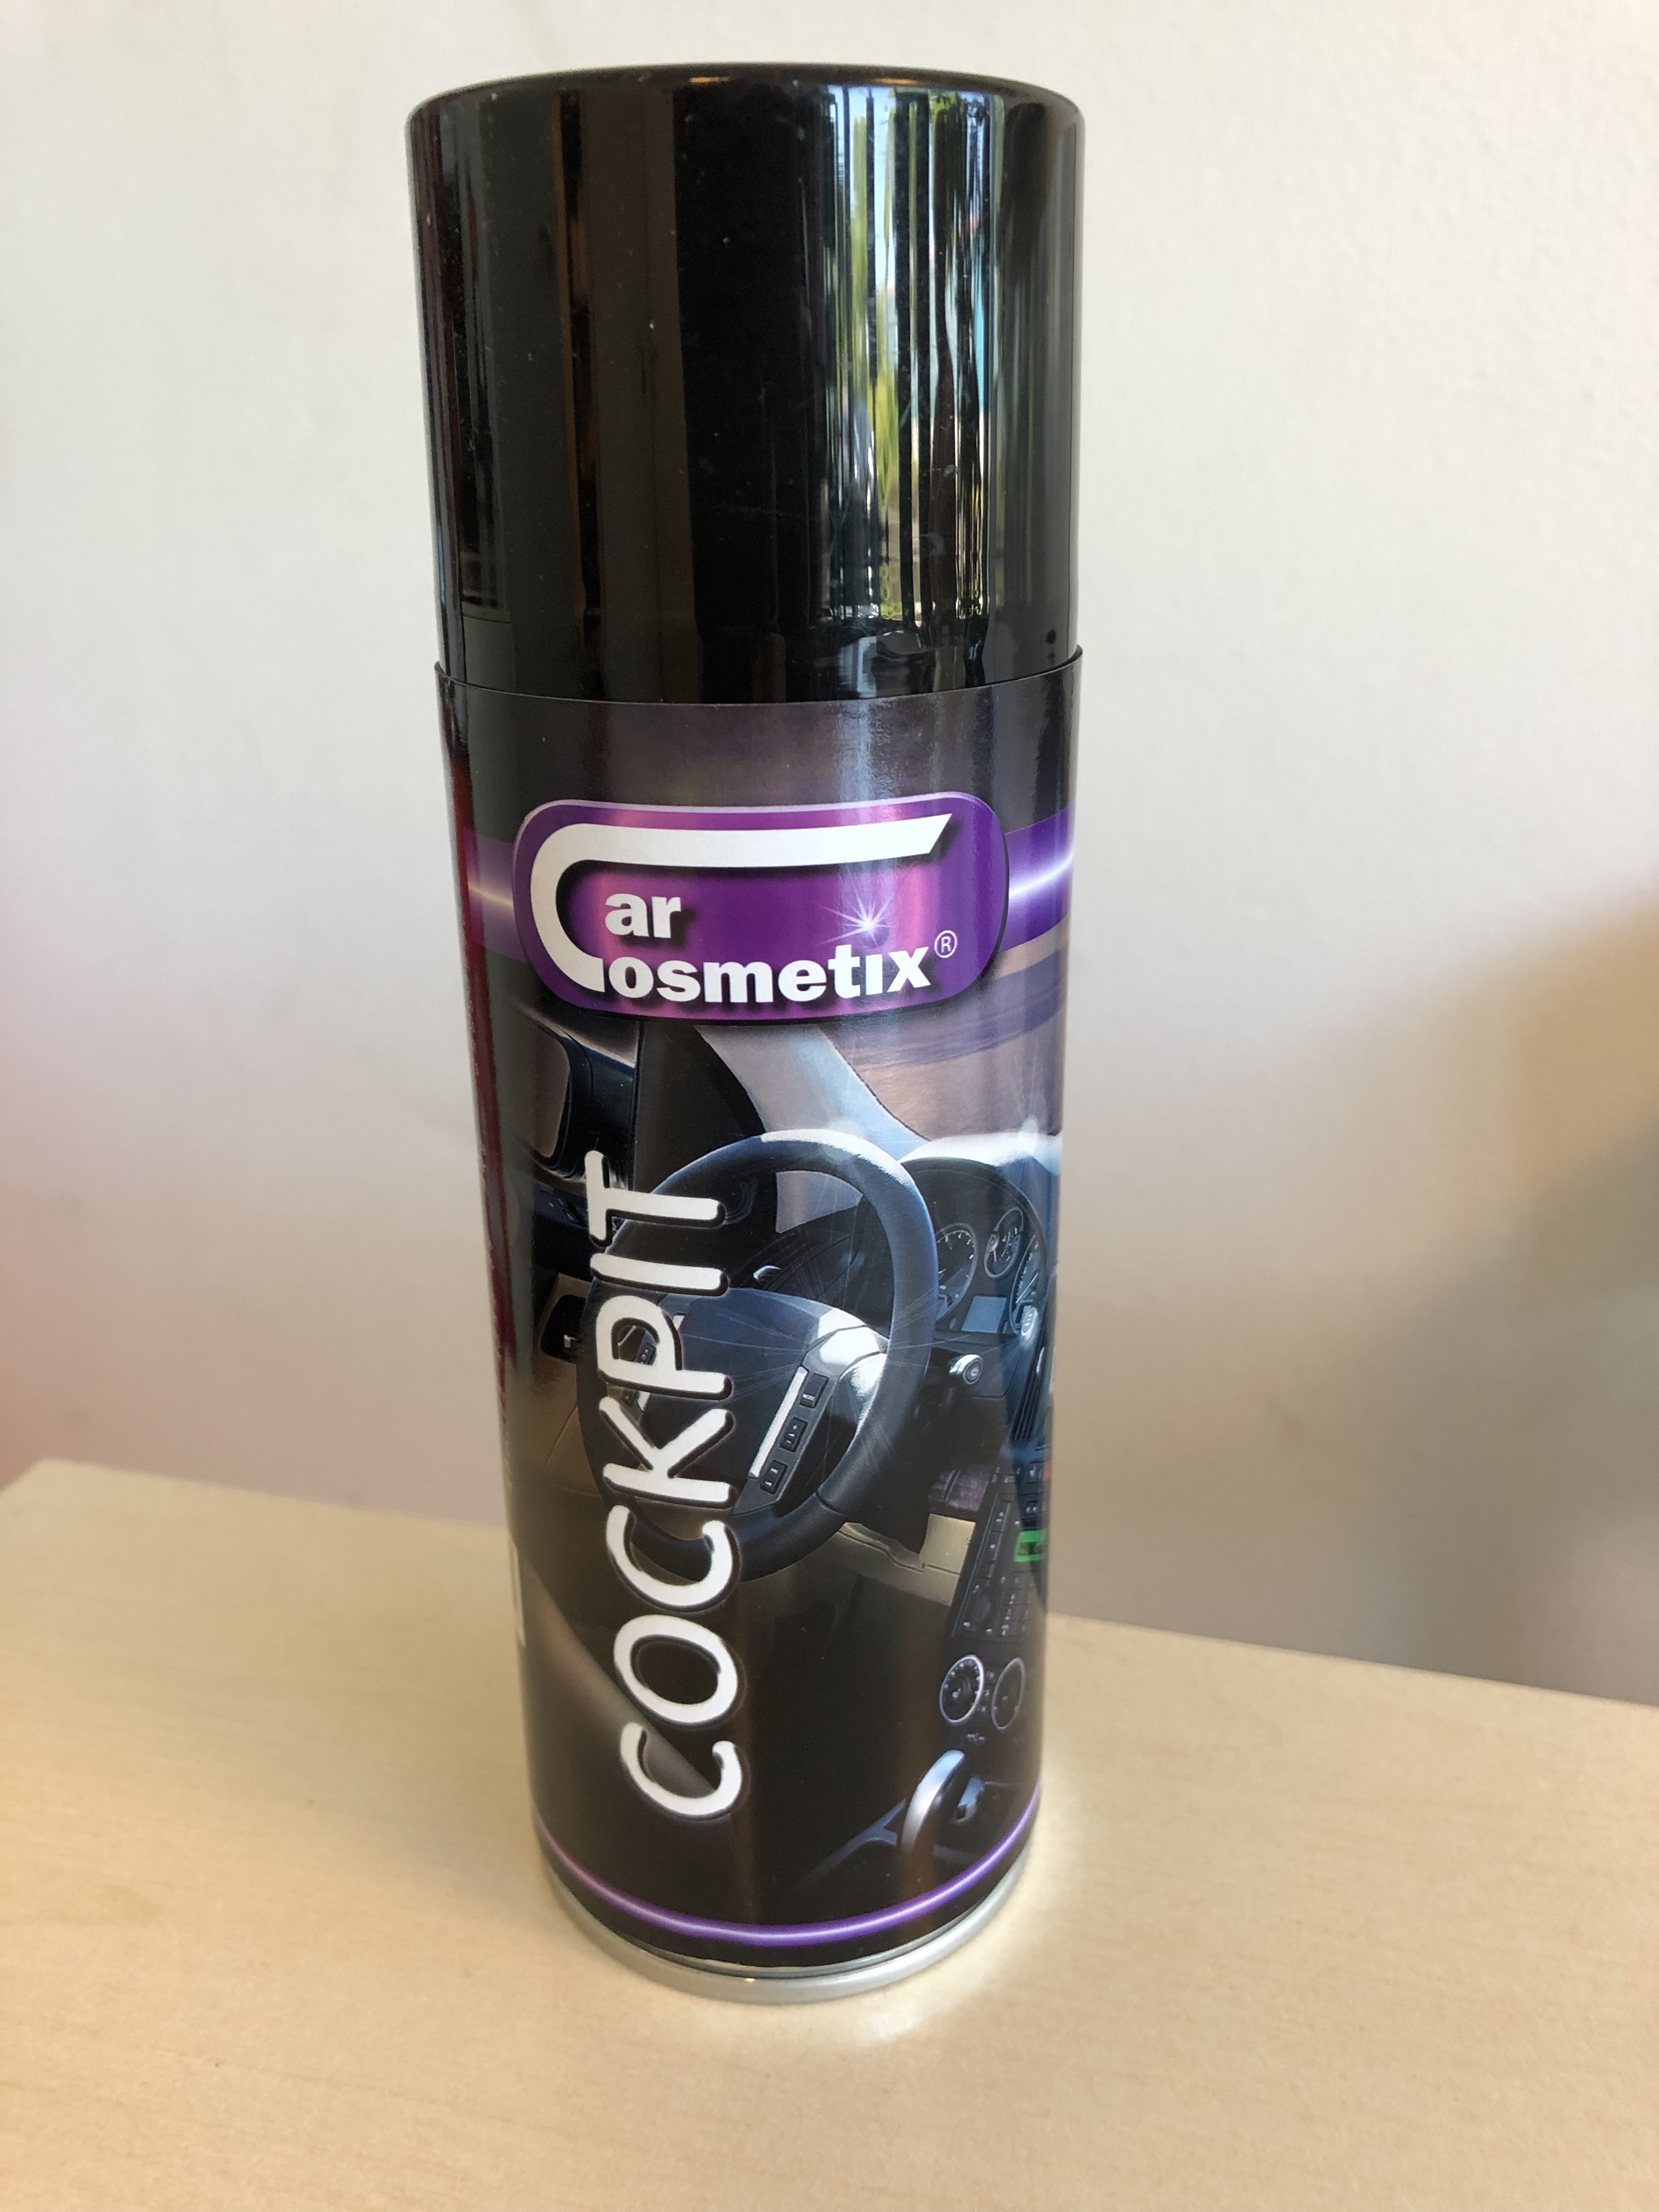 Cockpitspray